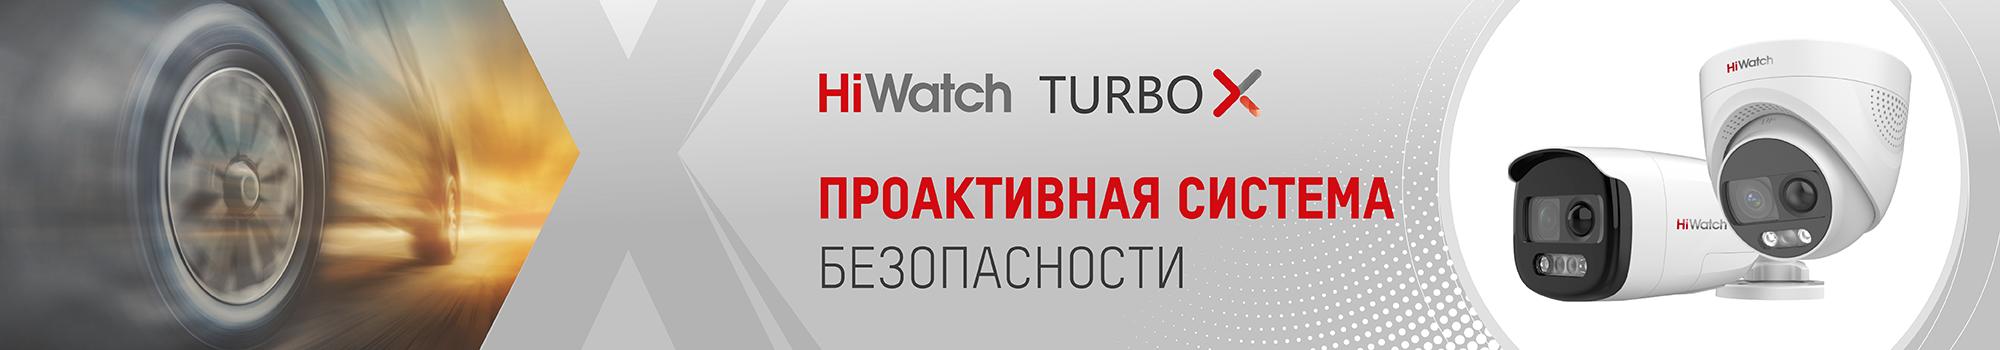 _turbo_x_hw_2000x350